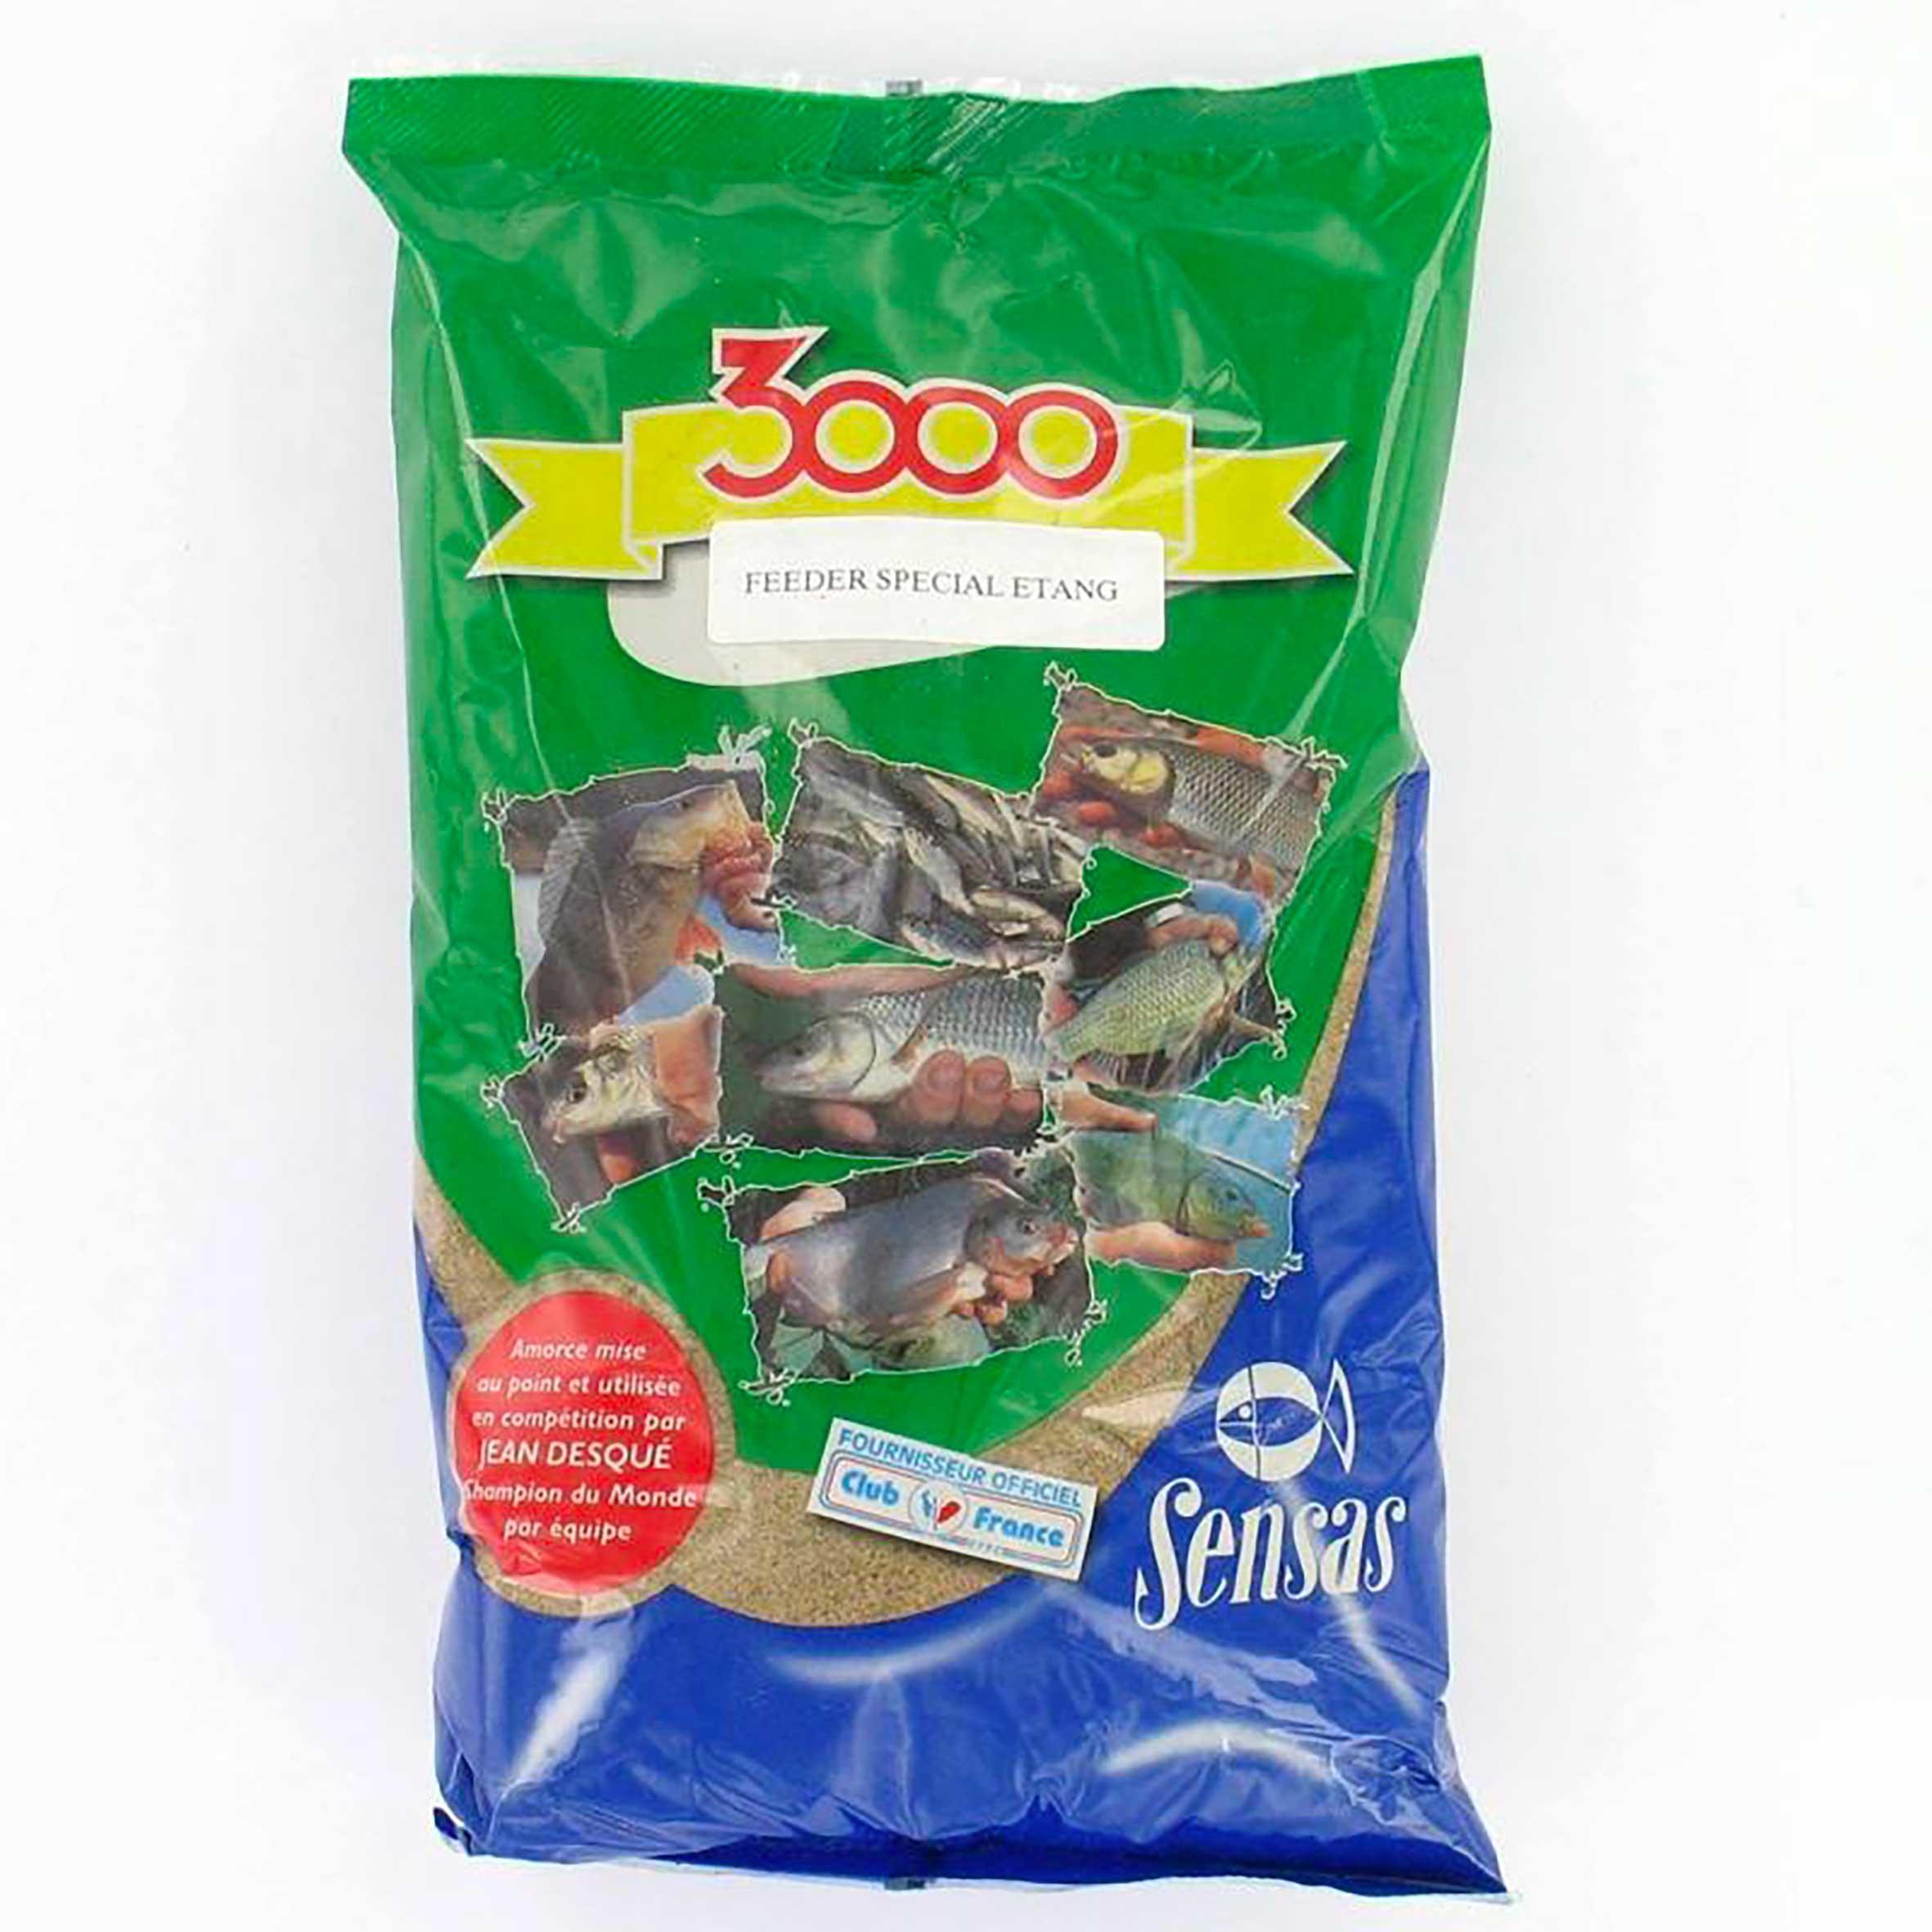 Nadă pescuit 3000 Feeder 1 kg